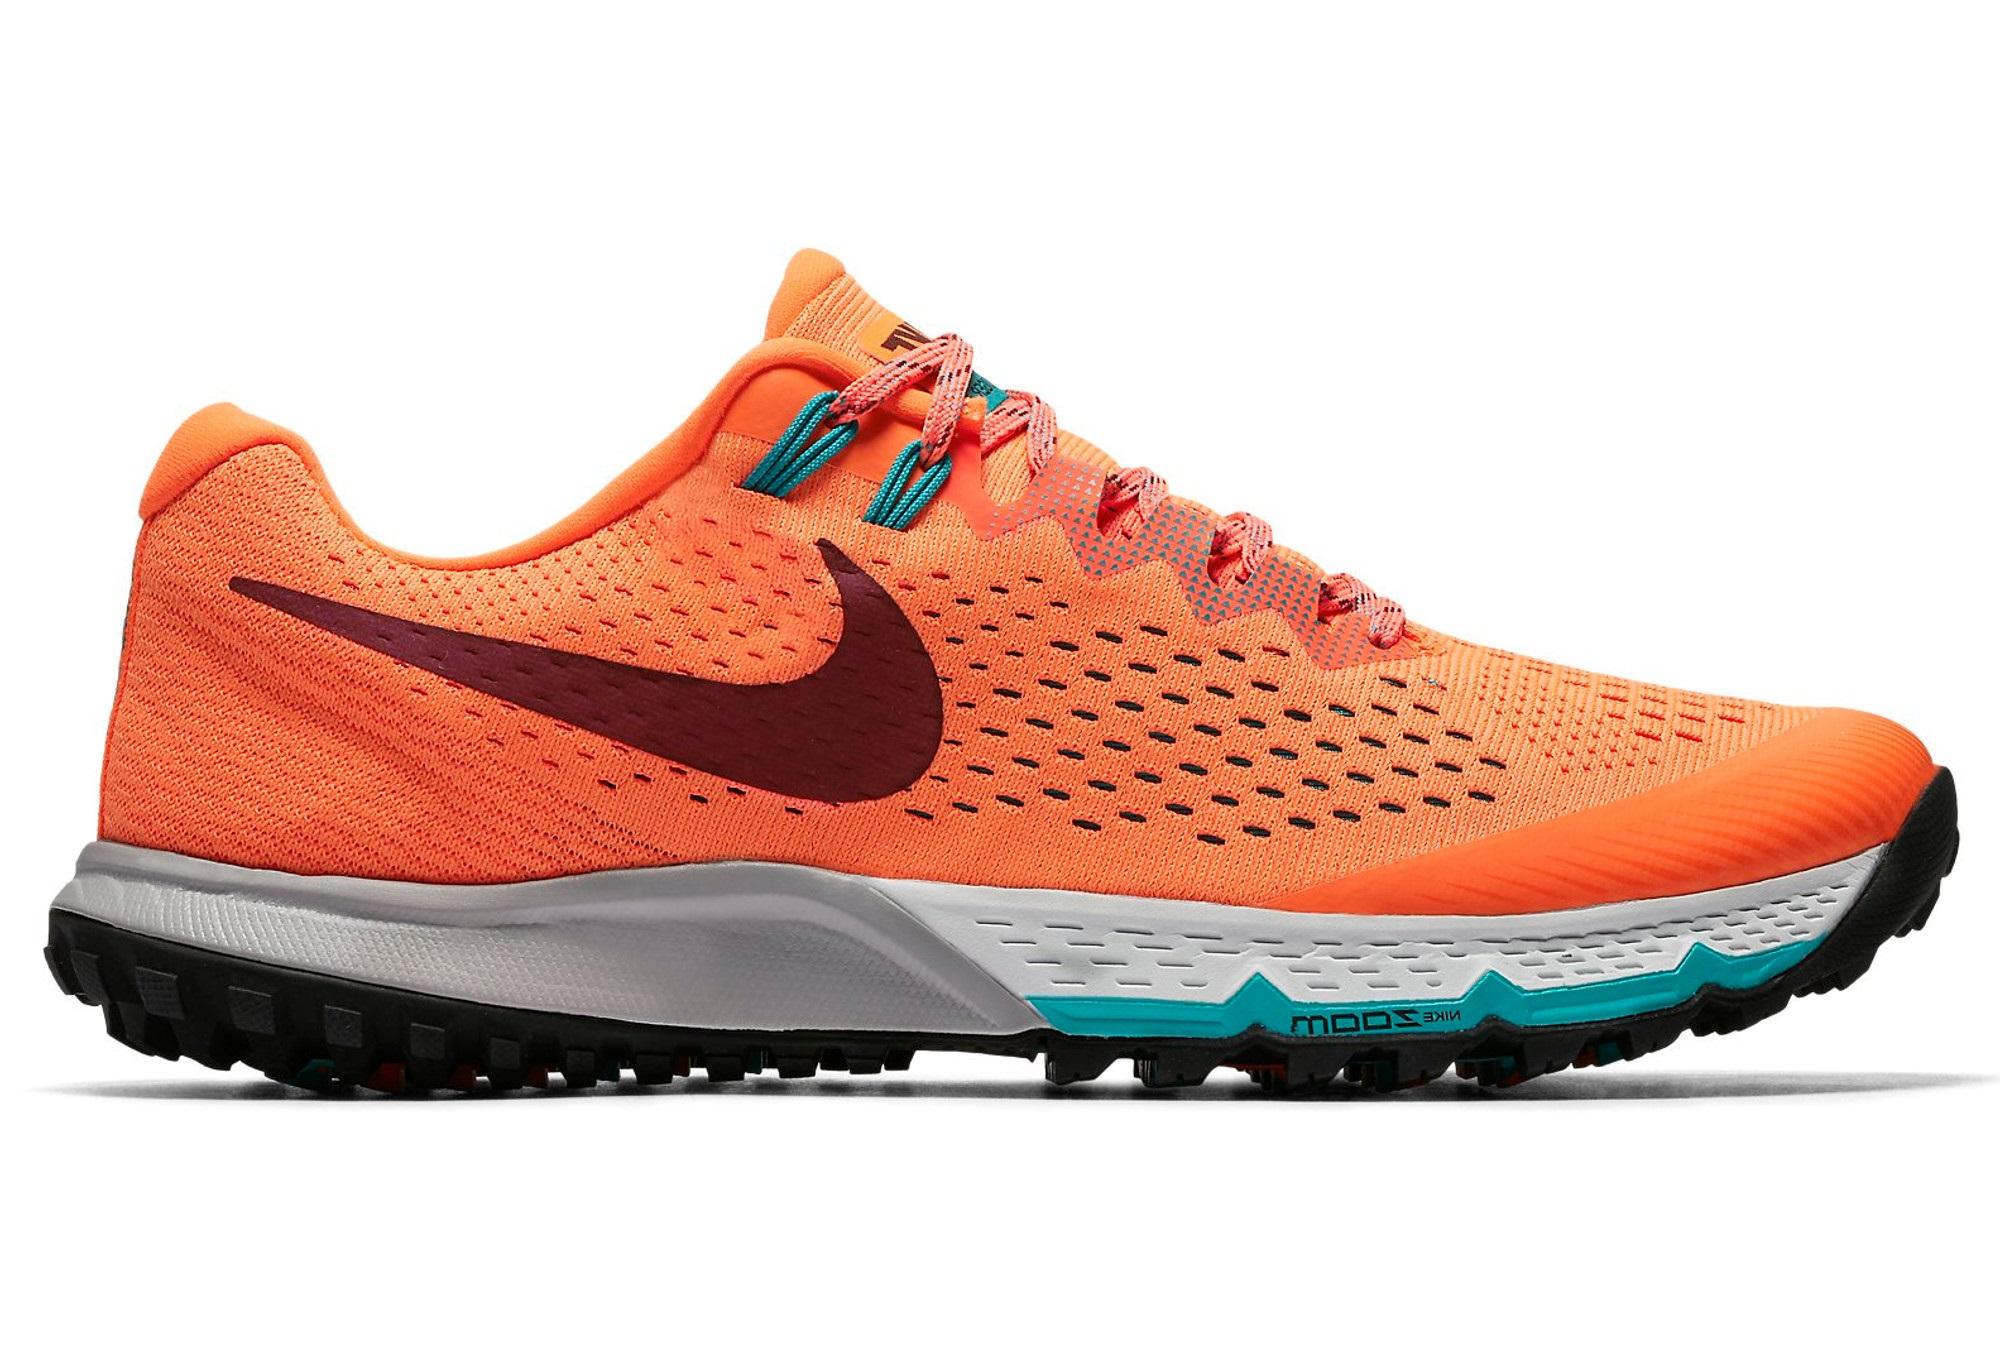 Terra Nike De Kiger Orange Gris Chaussures Beqdcxrowe Trail 4 NnwO08kZPX